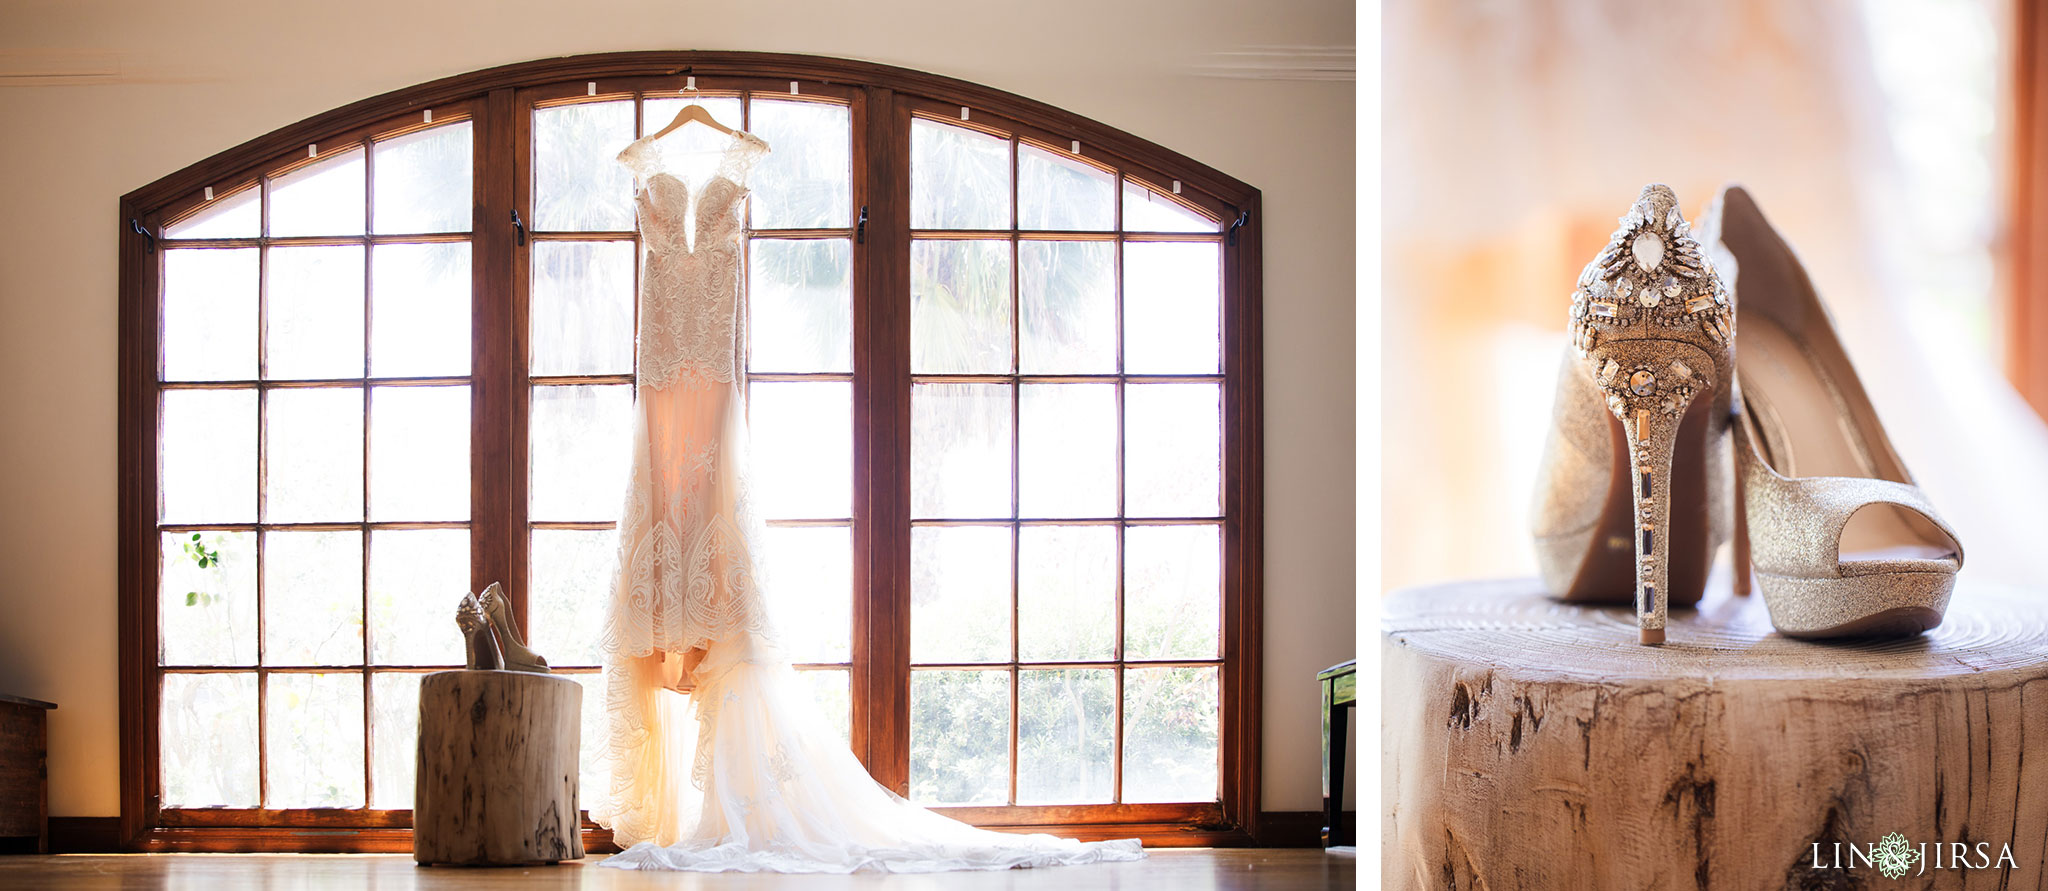 002 taglyan complex los angeles persian wedding photography